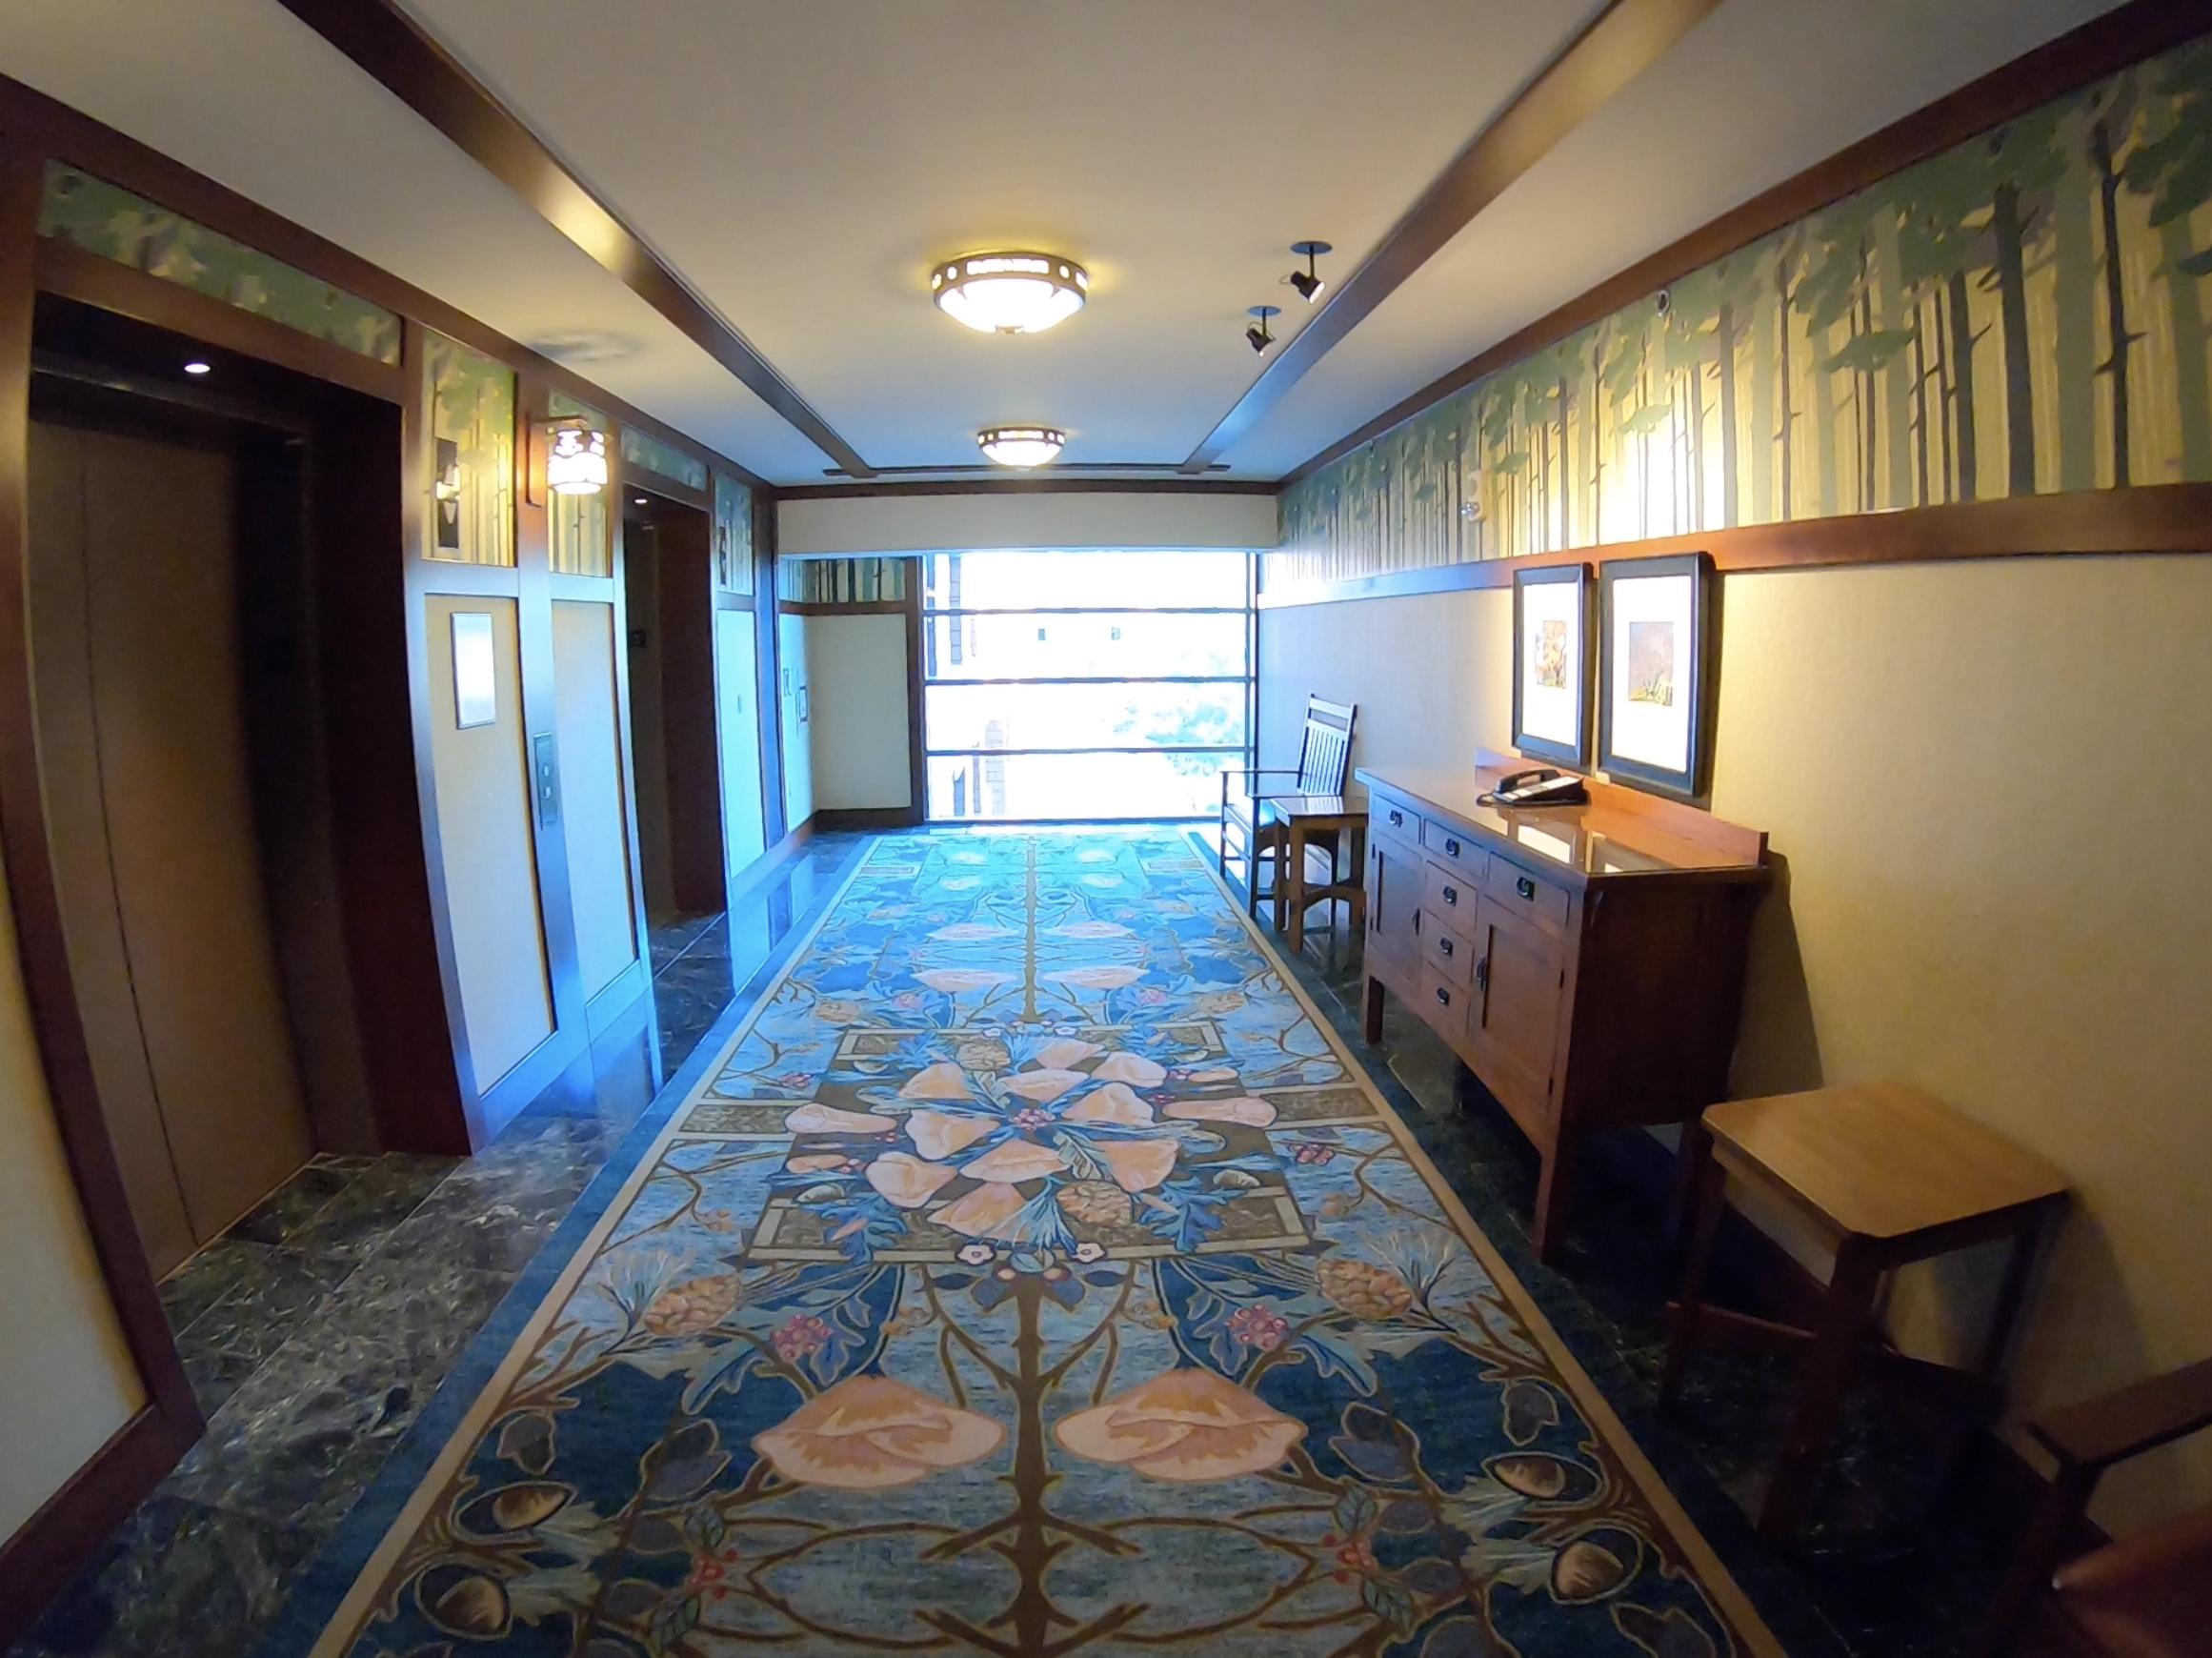 GrandCalifornia hallway